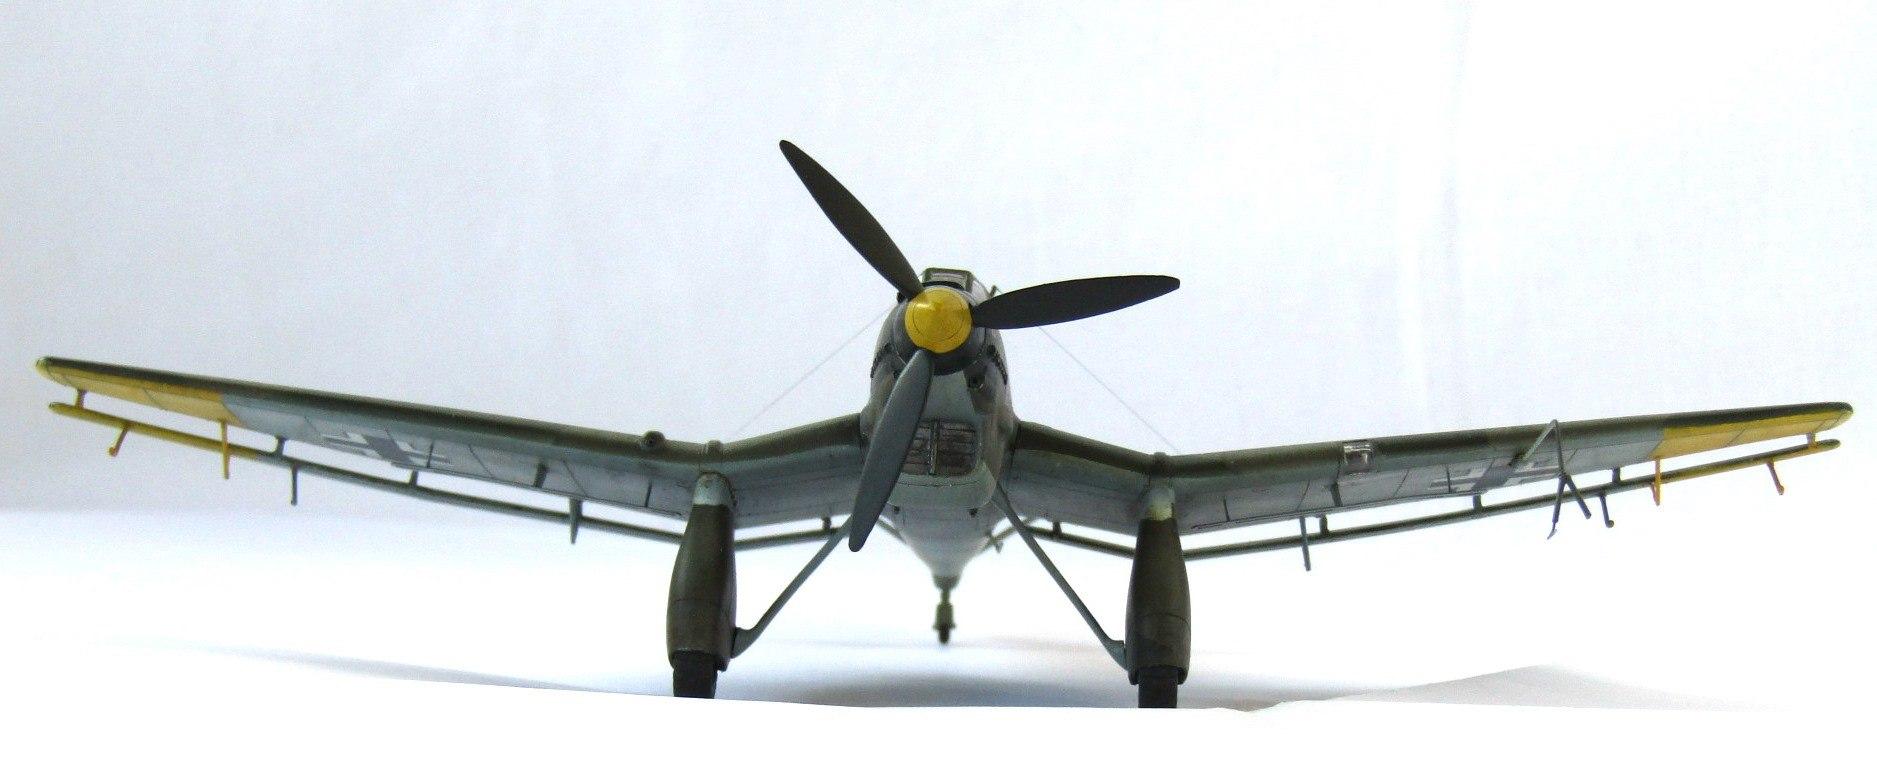 Ju-87A 1/72 (Special Hobby) 9ZmQJ7TZqfs